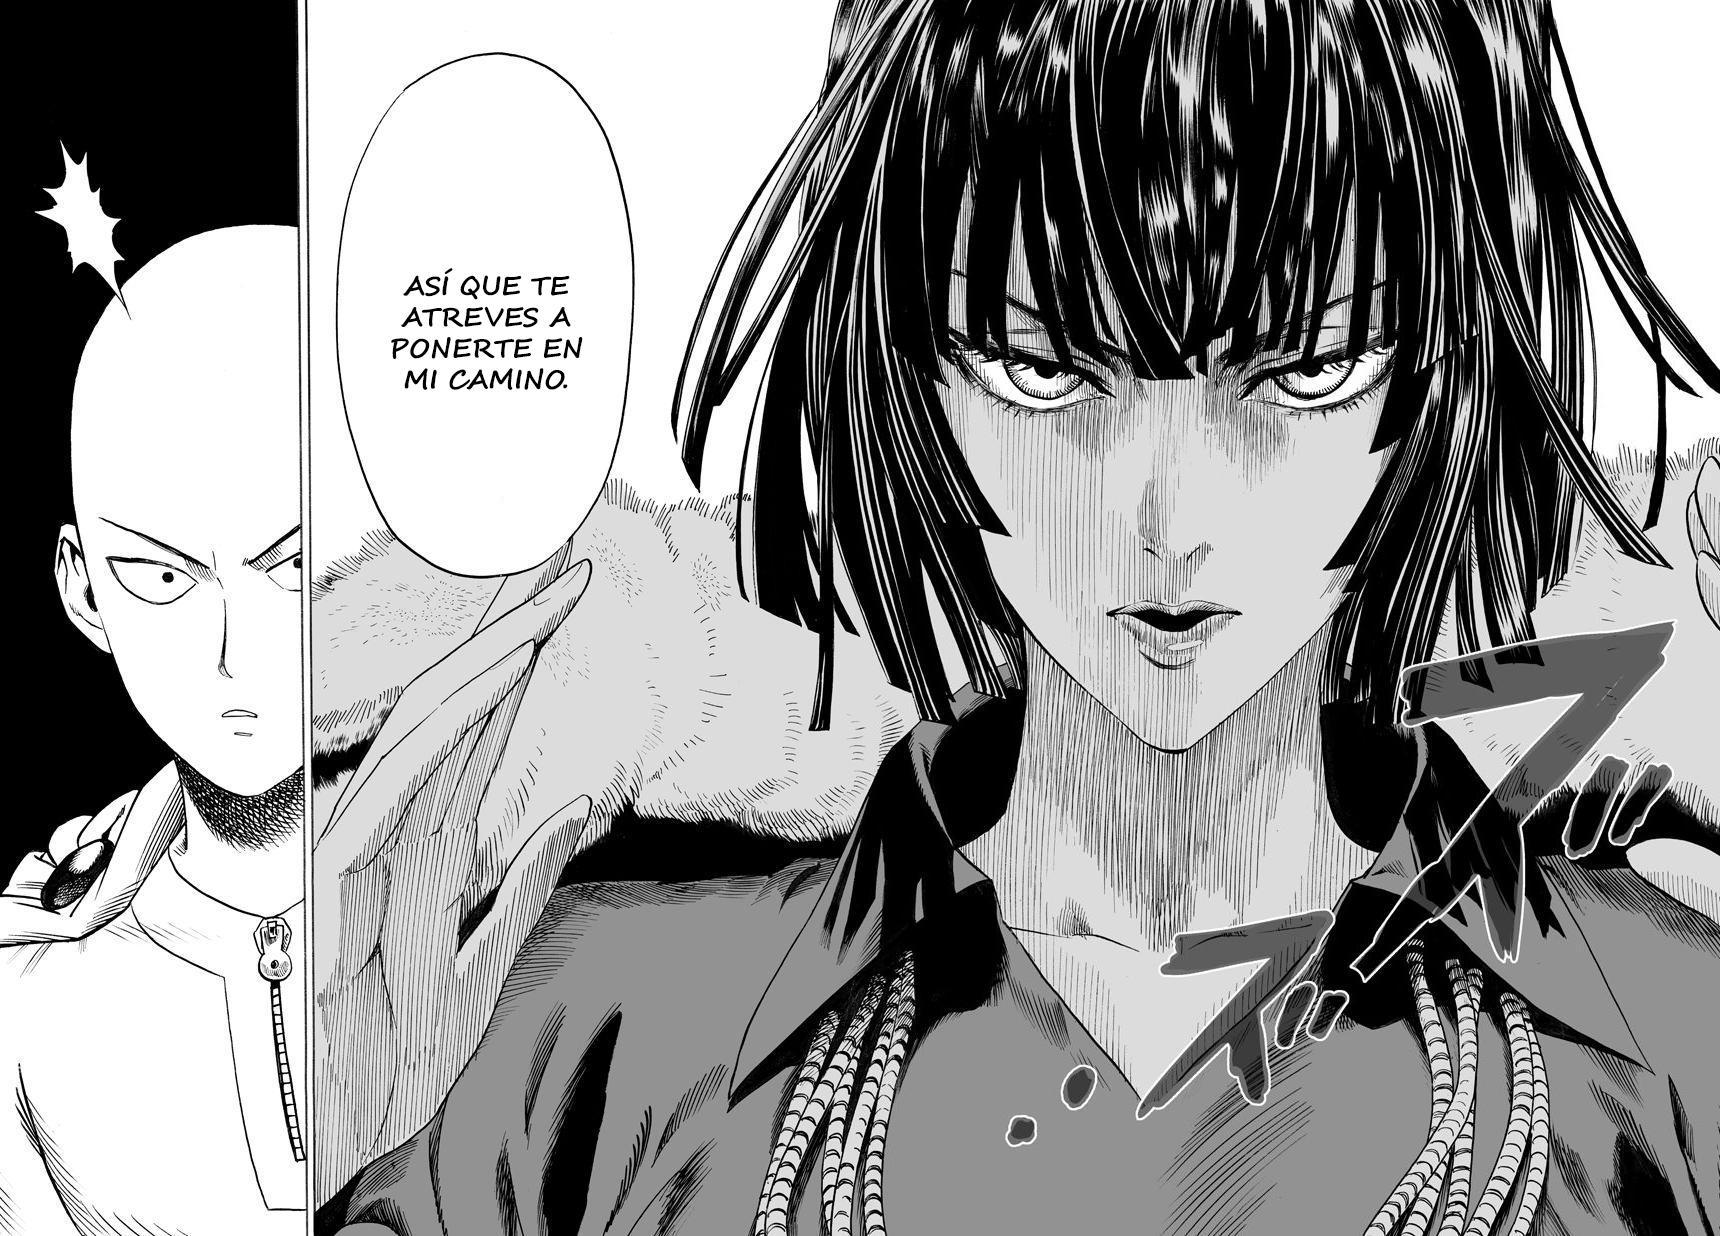 http://c5.ninemanga.com/es_manga/21/14805/362335/d9c545300165a1ff85a9f729d21bf97b.jpg Page 3